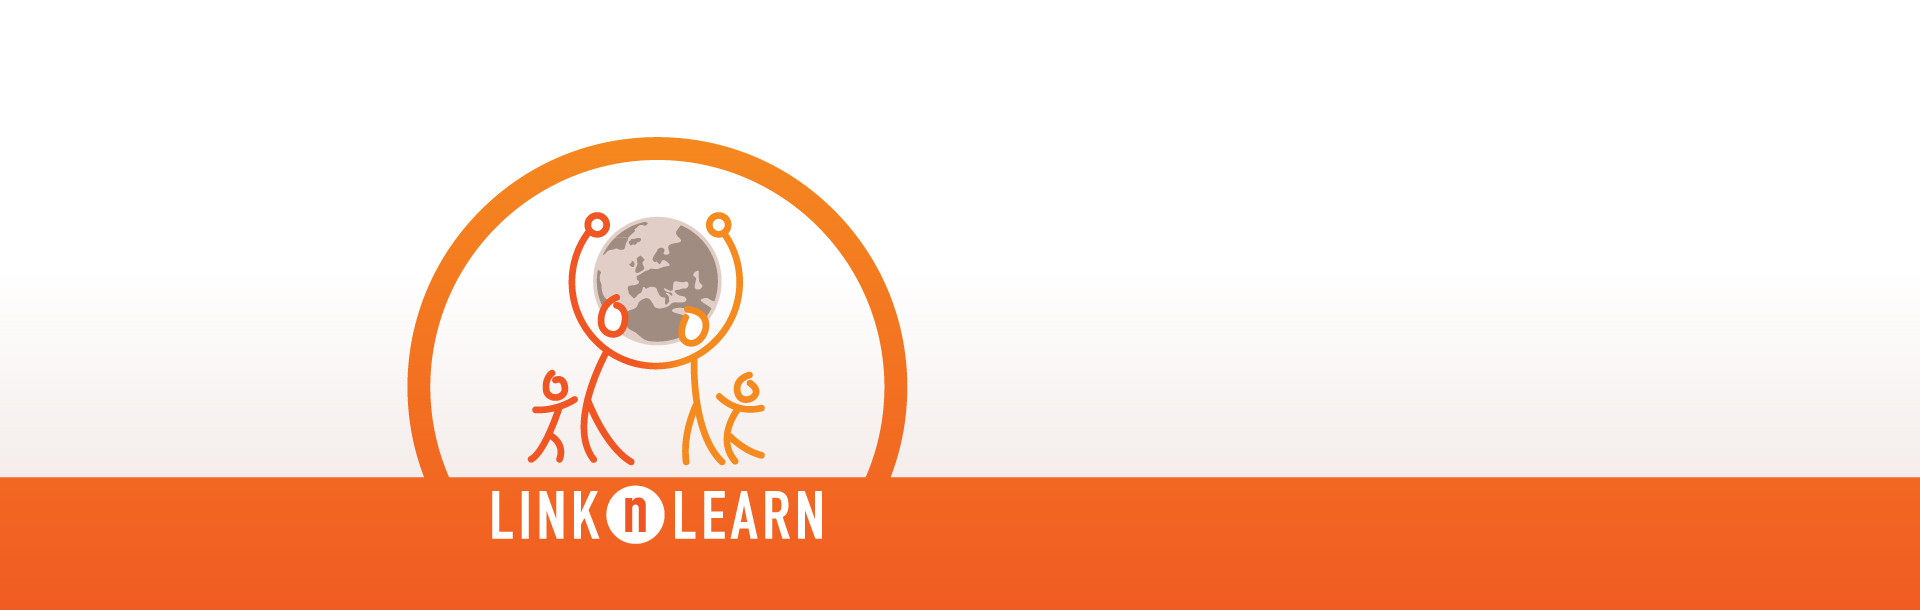 Link N Learn - Banner 1-1